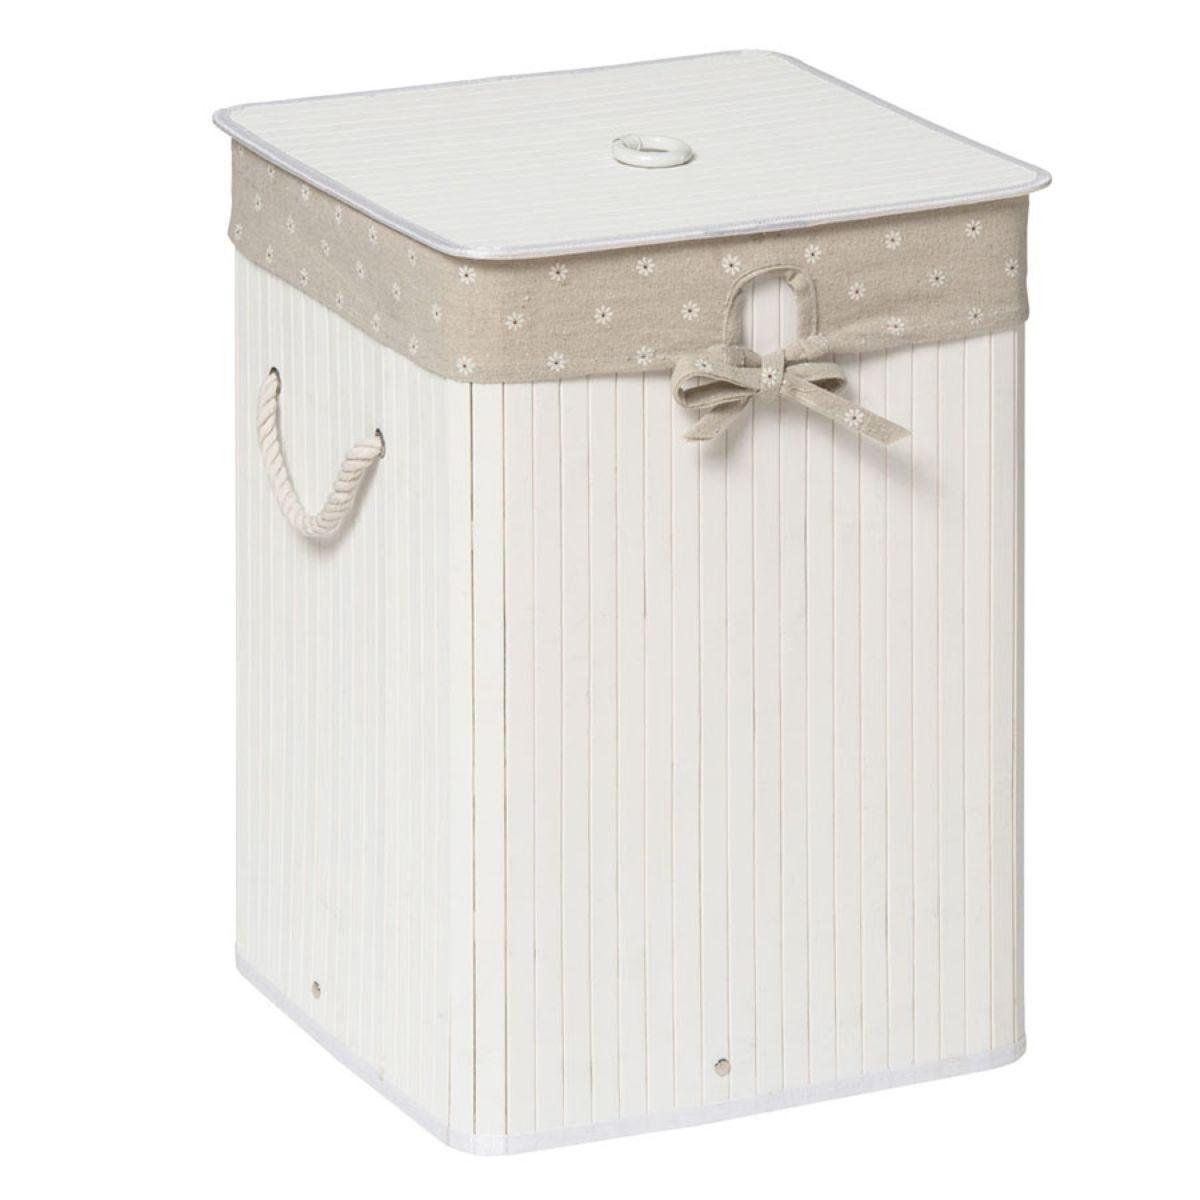 Premier Housewares Kankyo Bamboo Laundry Hamper - White Bamboo